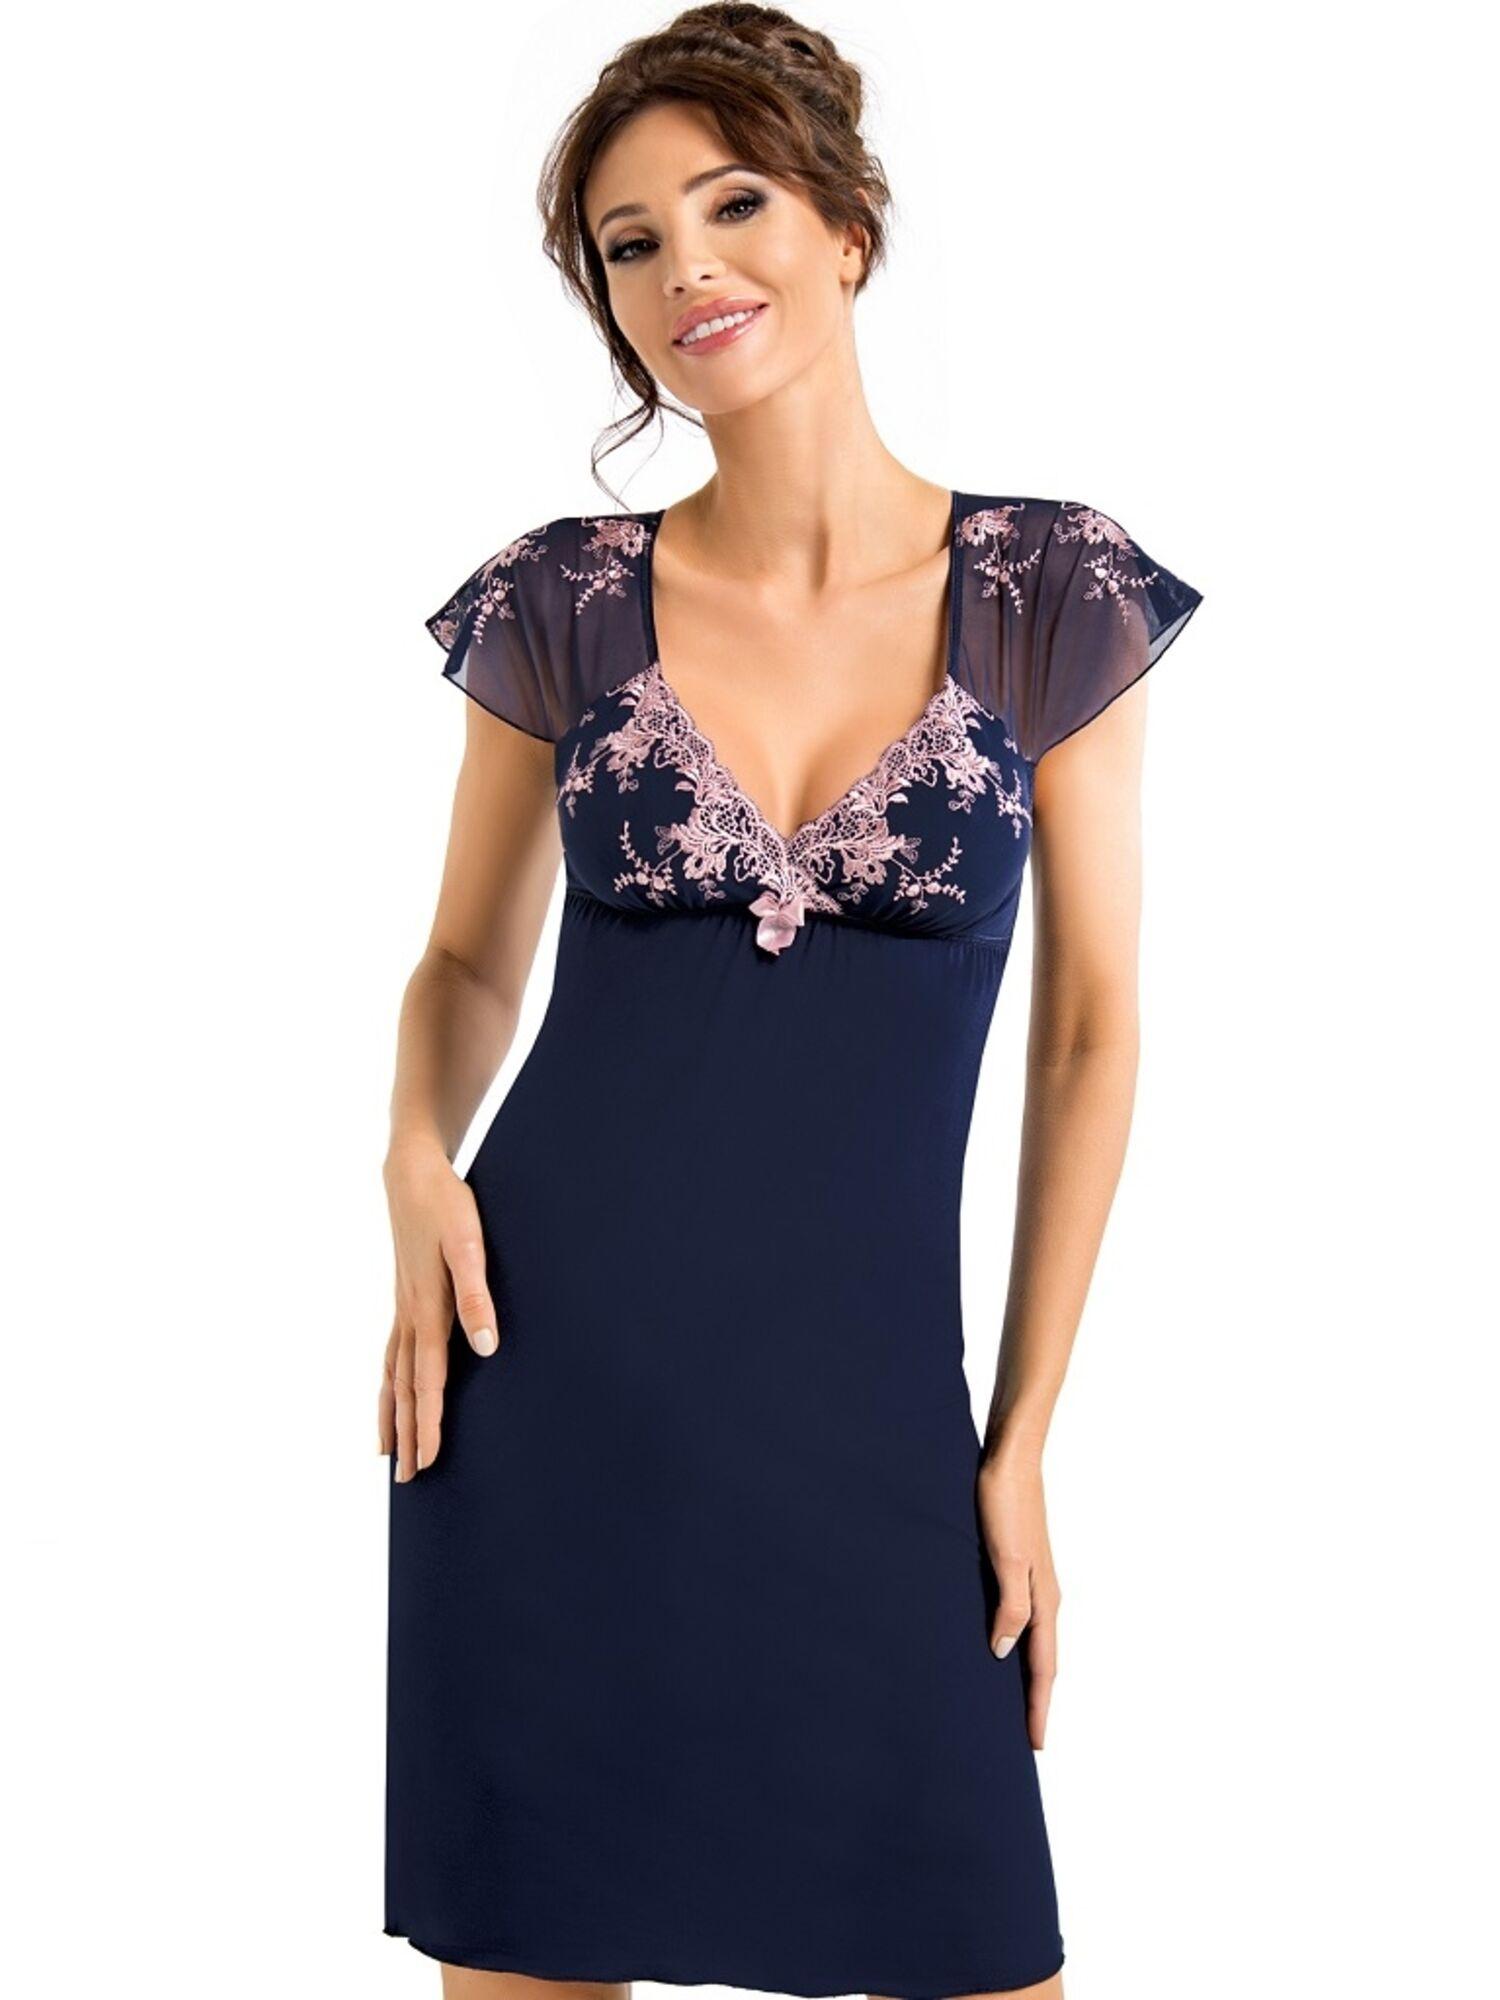 Сорочка женская из вискозы VALENTINE, синий DONNA II